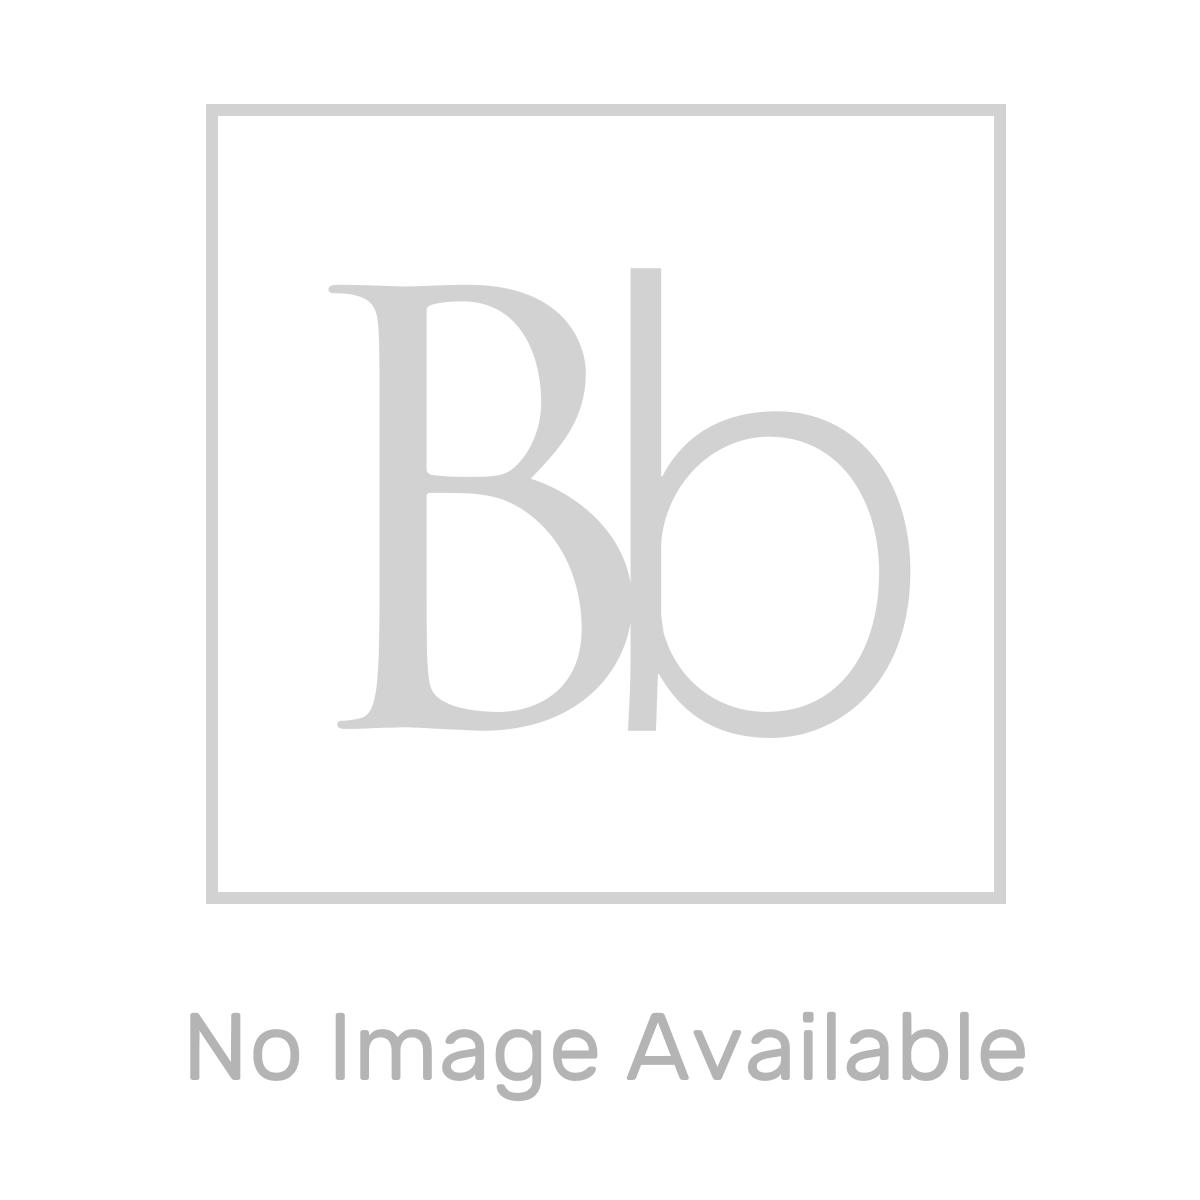 RAK Ecofix White Flush Plate with Round Push Buttons